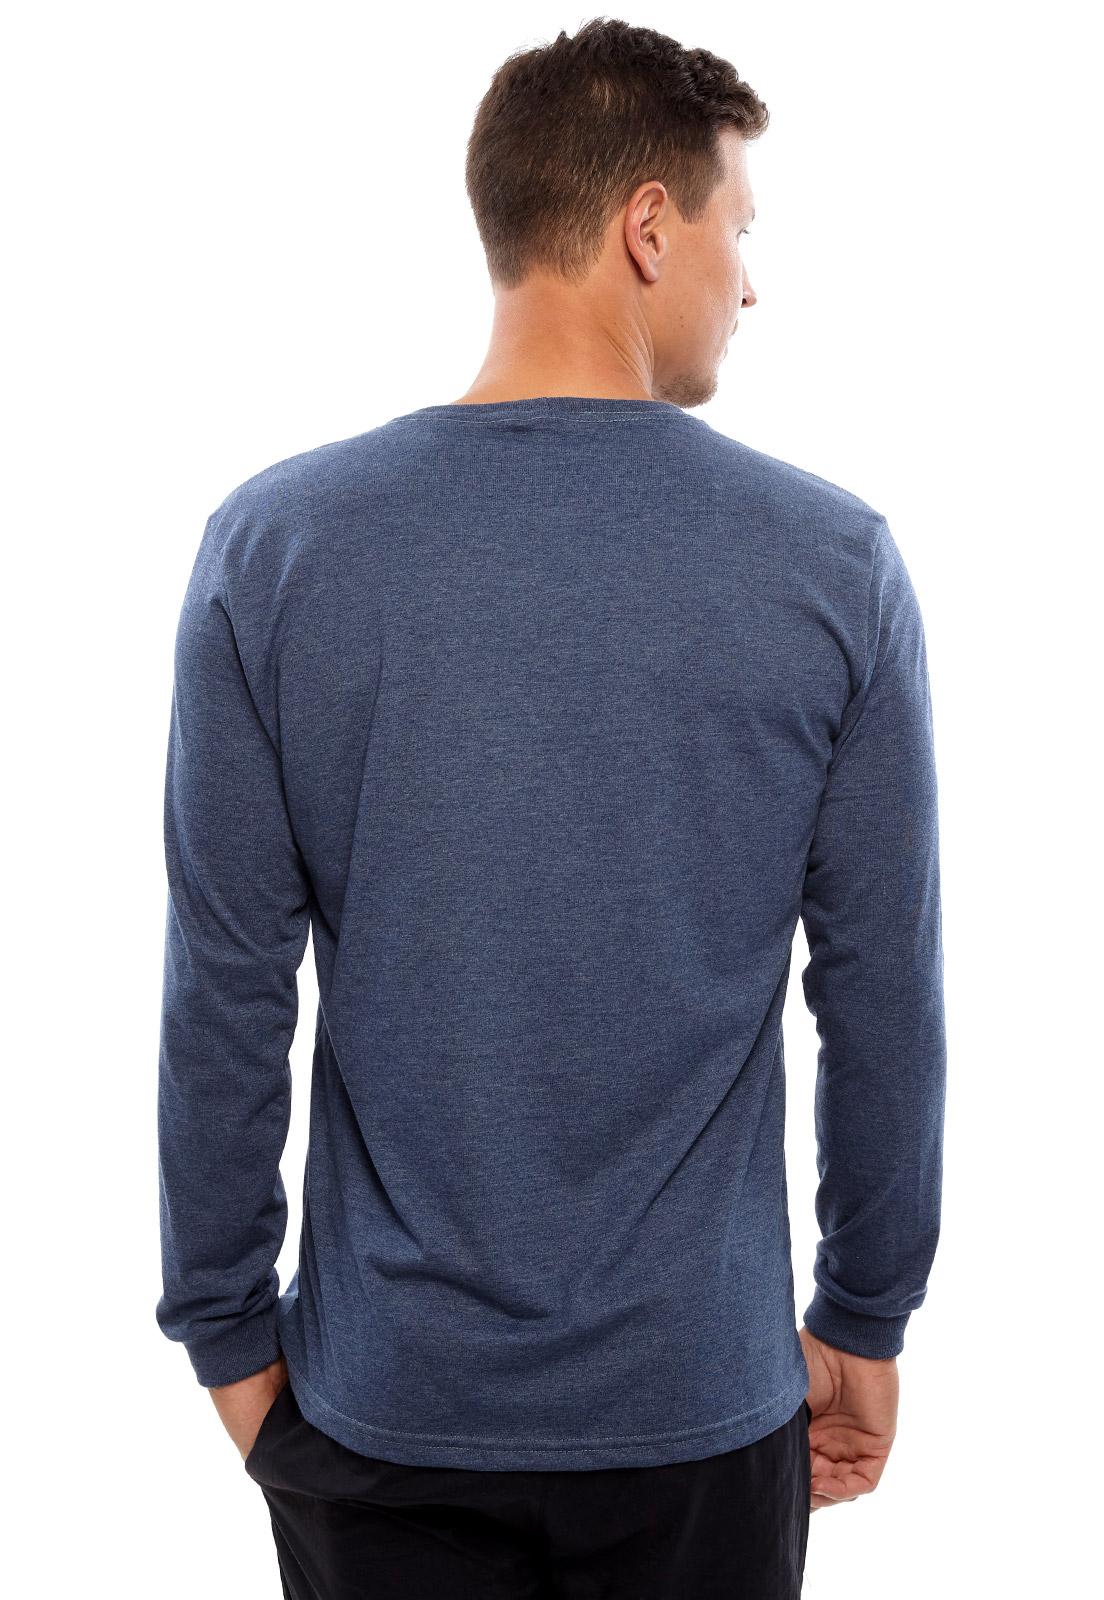 Camiseta Vida Marinha Manga Longa Azul